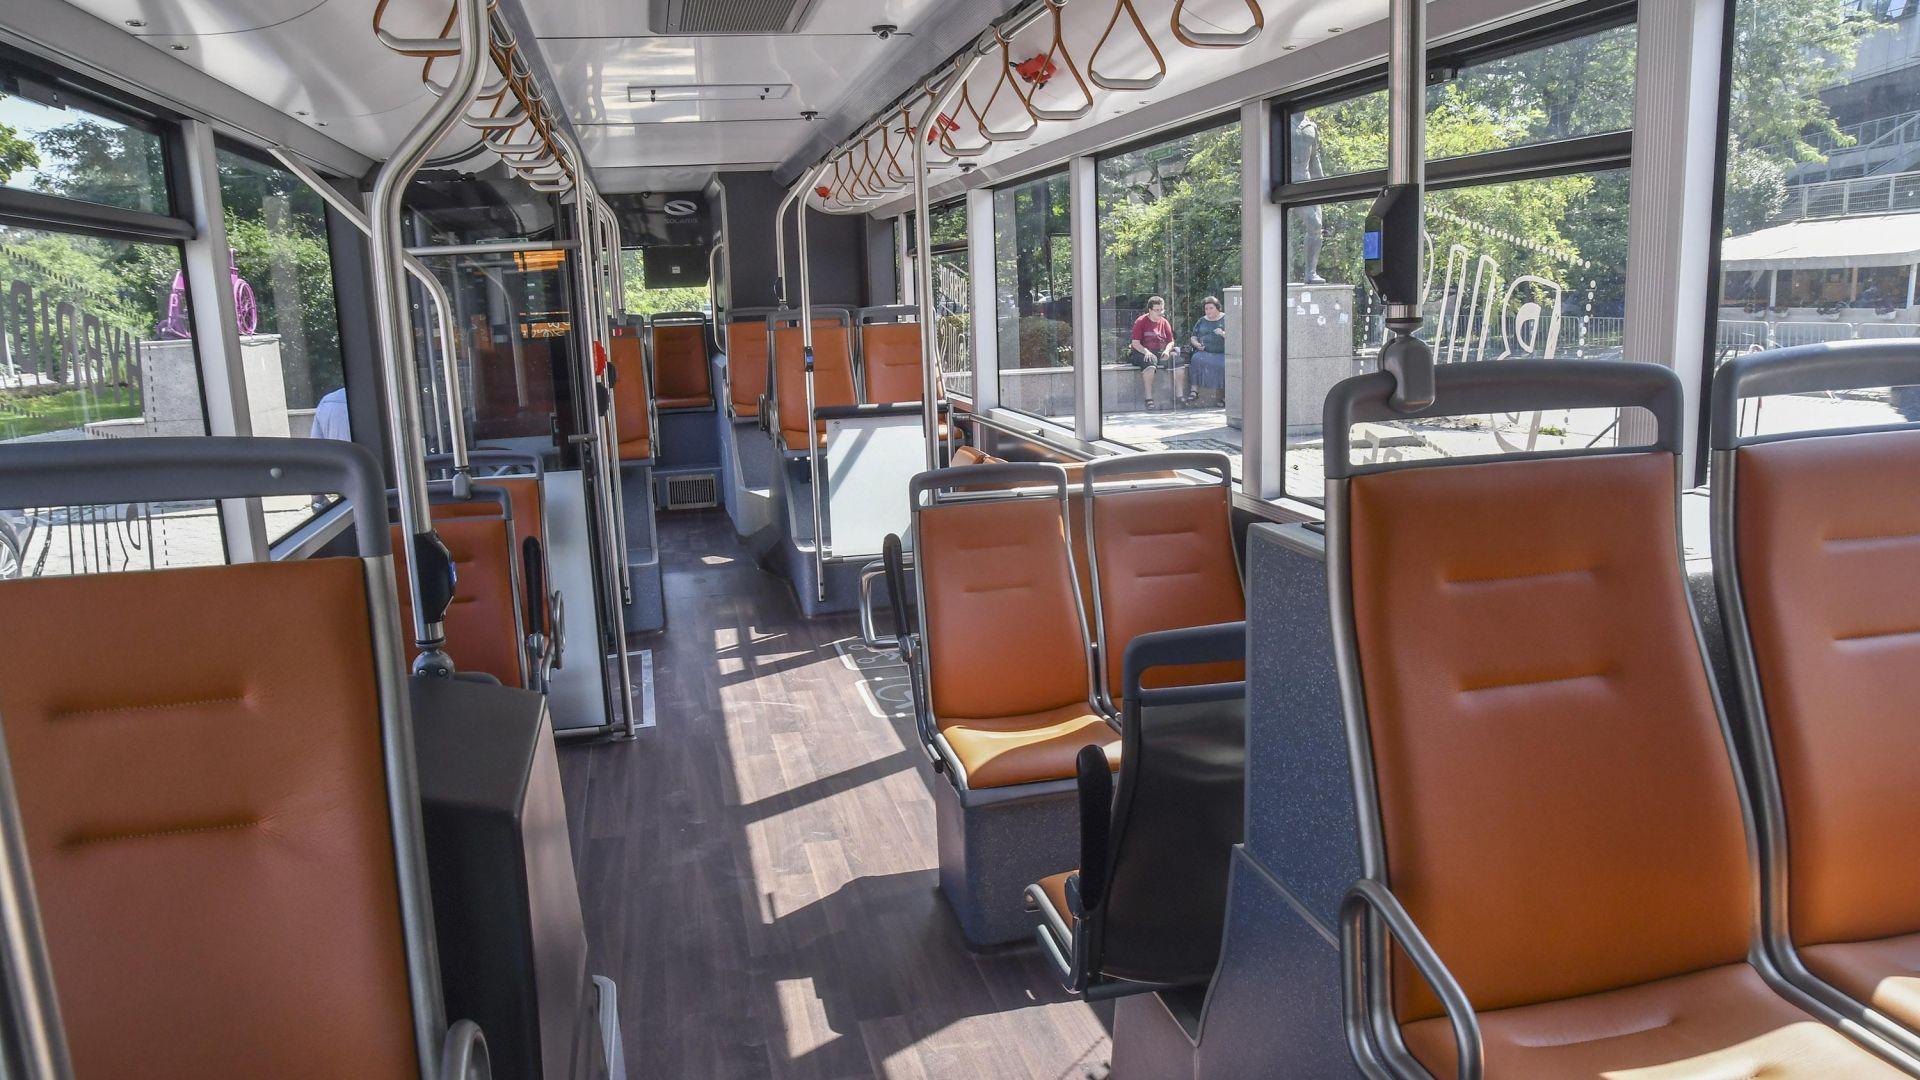 София обновява градския транспорт с 82 електробуса, 30 тролея и 25 трамвая